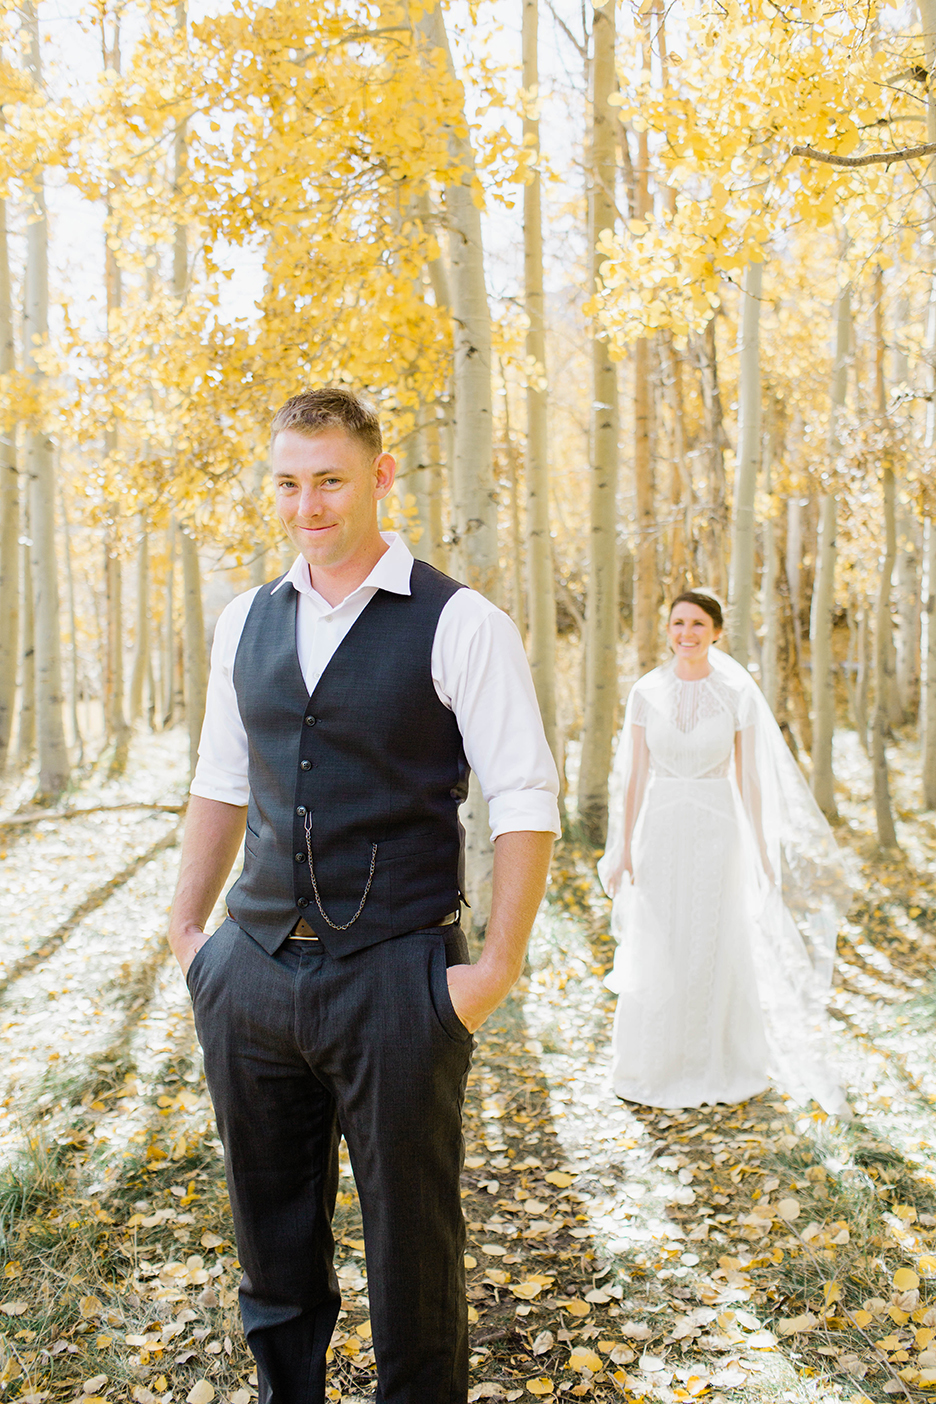 los_angeles_wedding_photographer 3.jpg